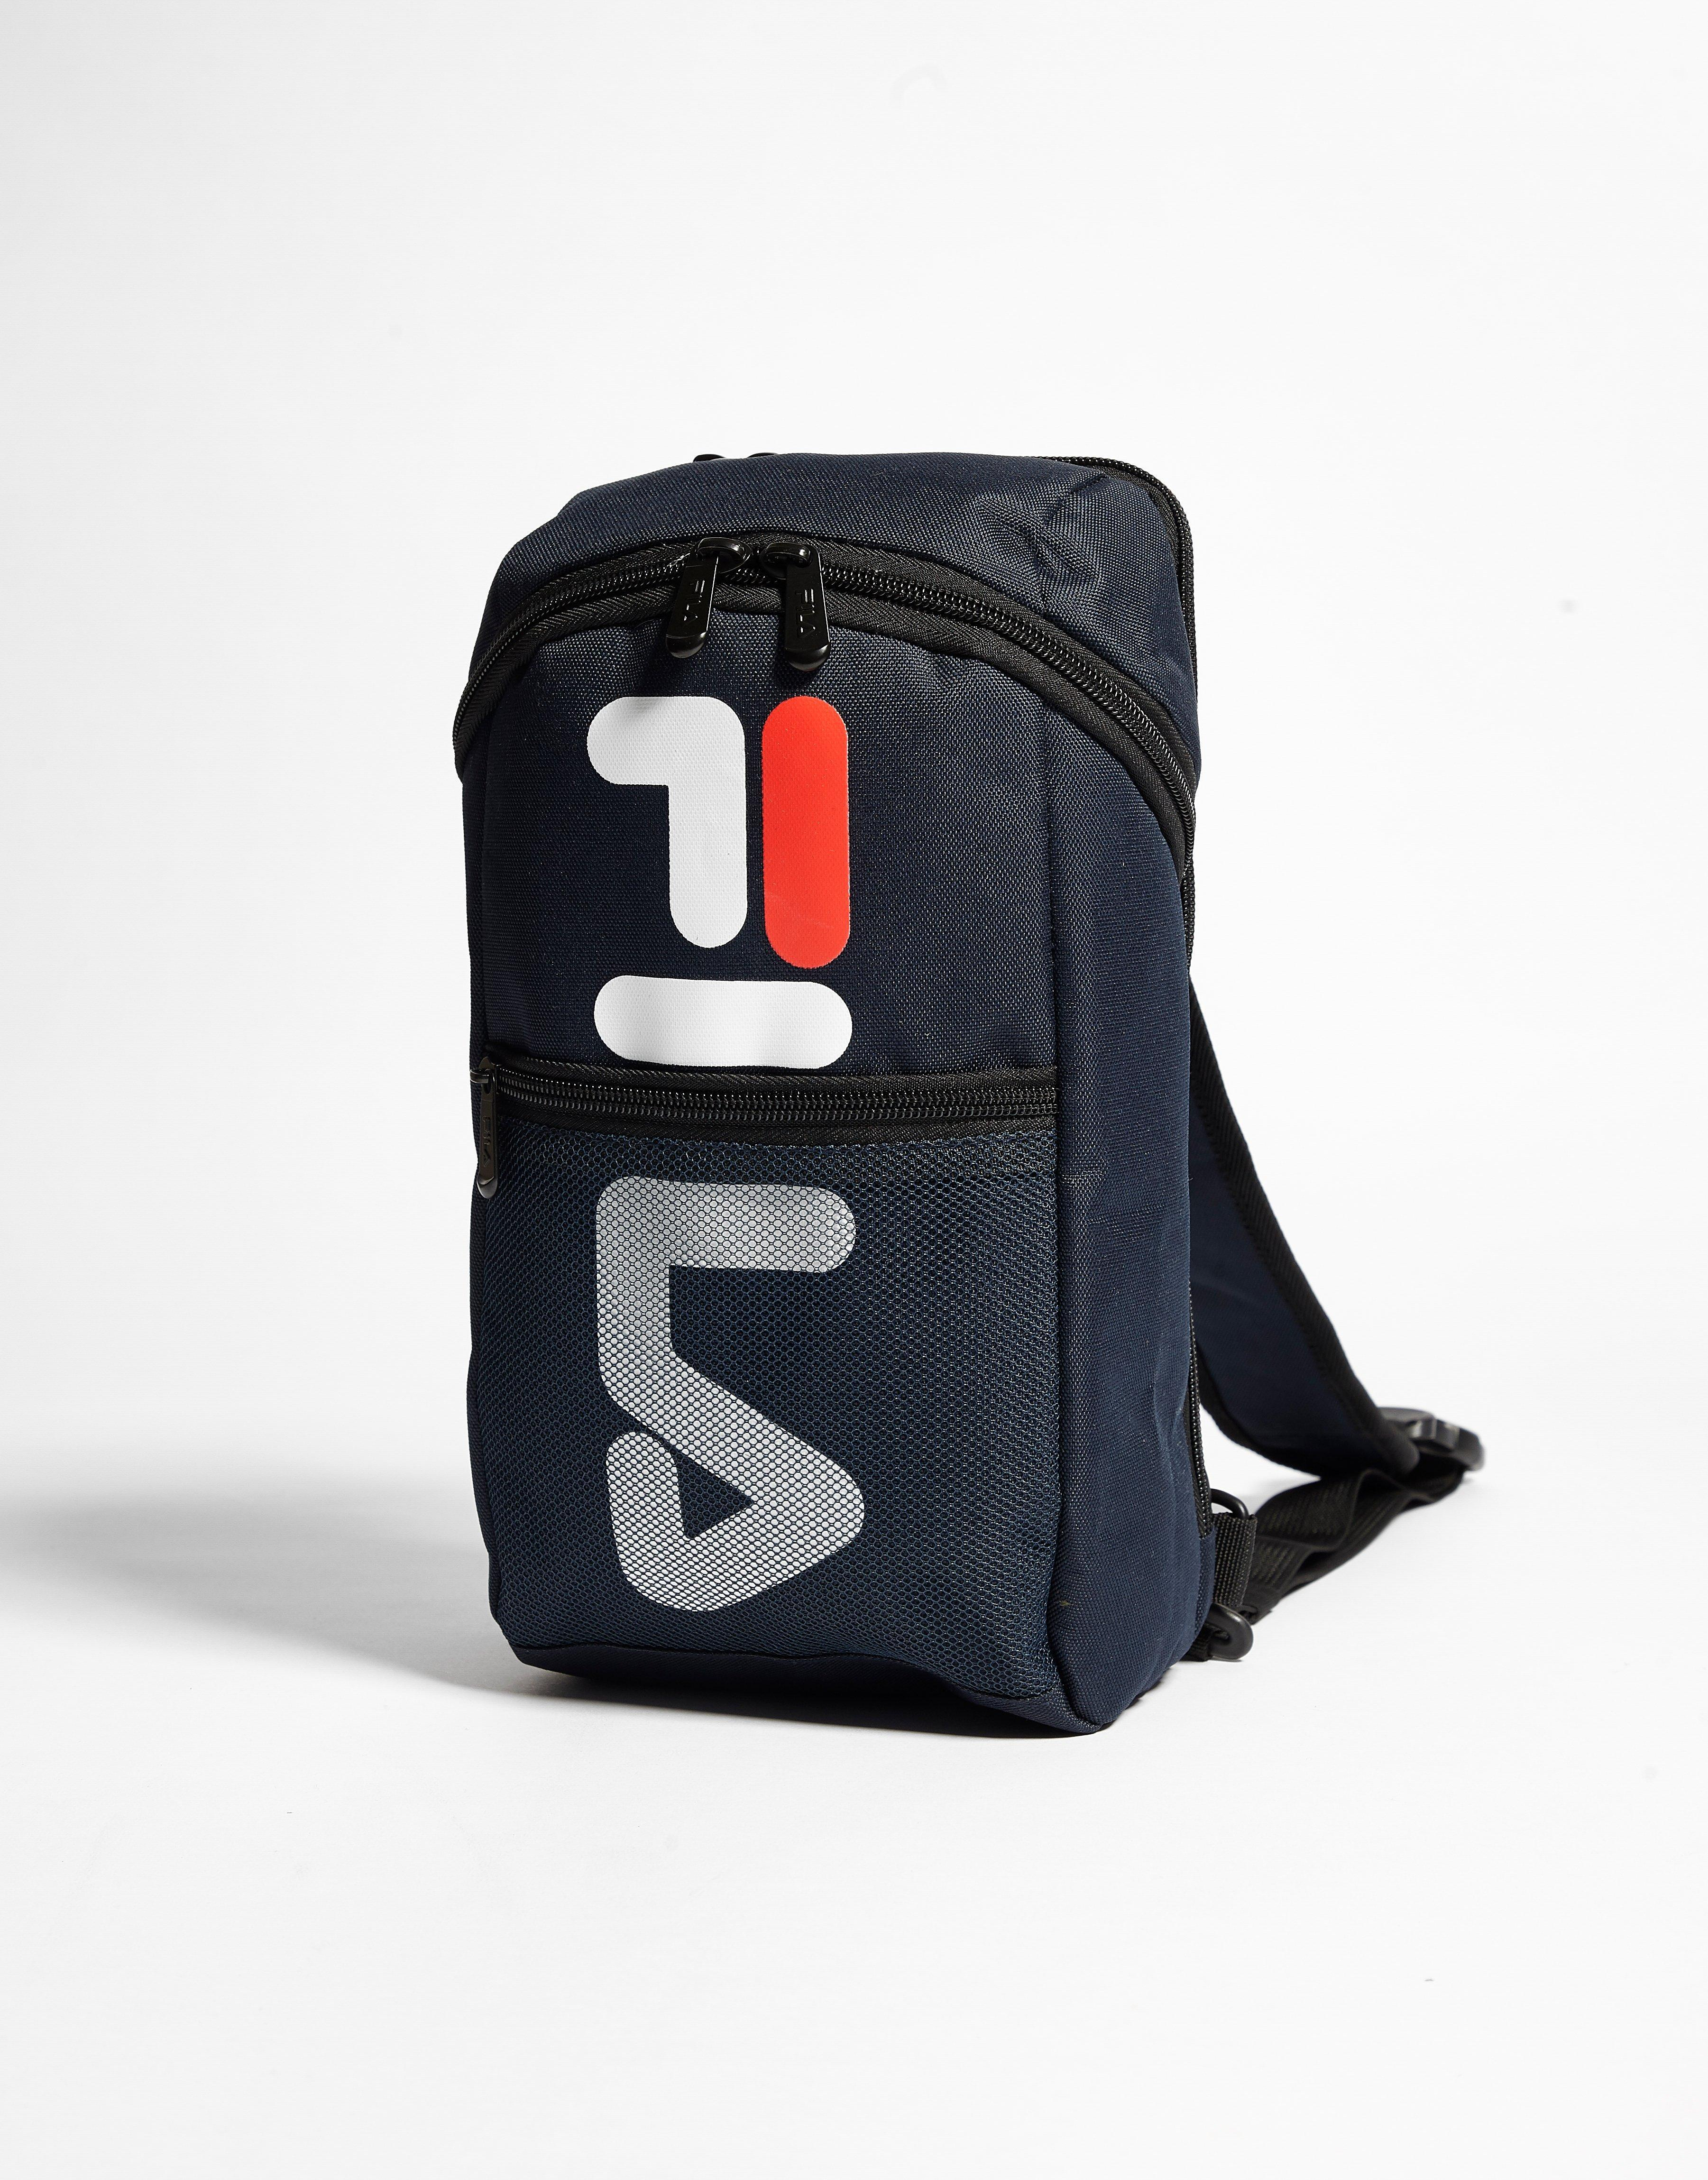 b00b32bf97 Man Bags Jd Sports